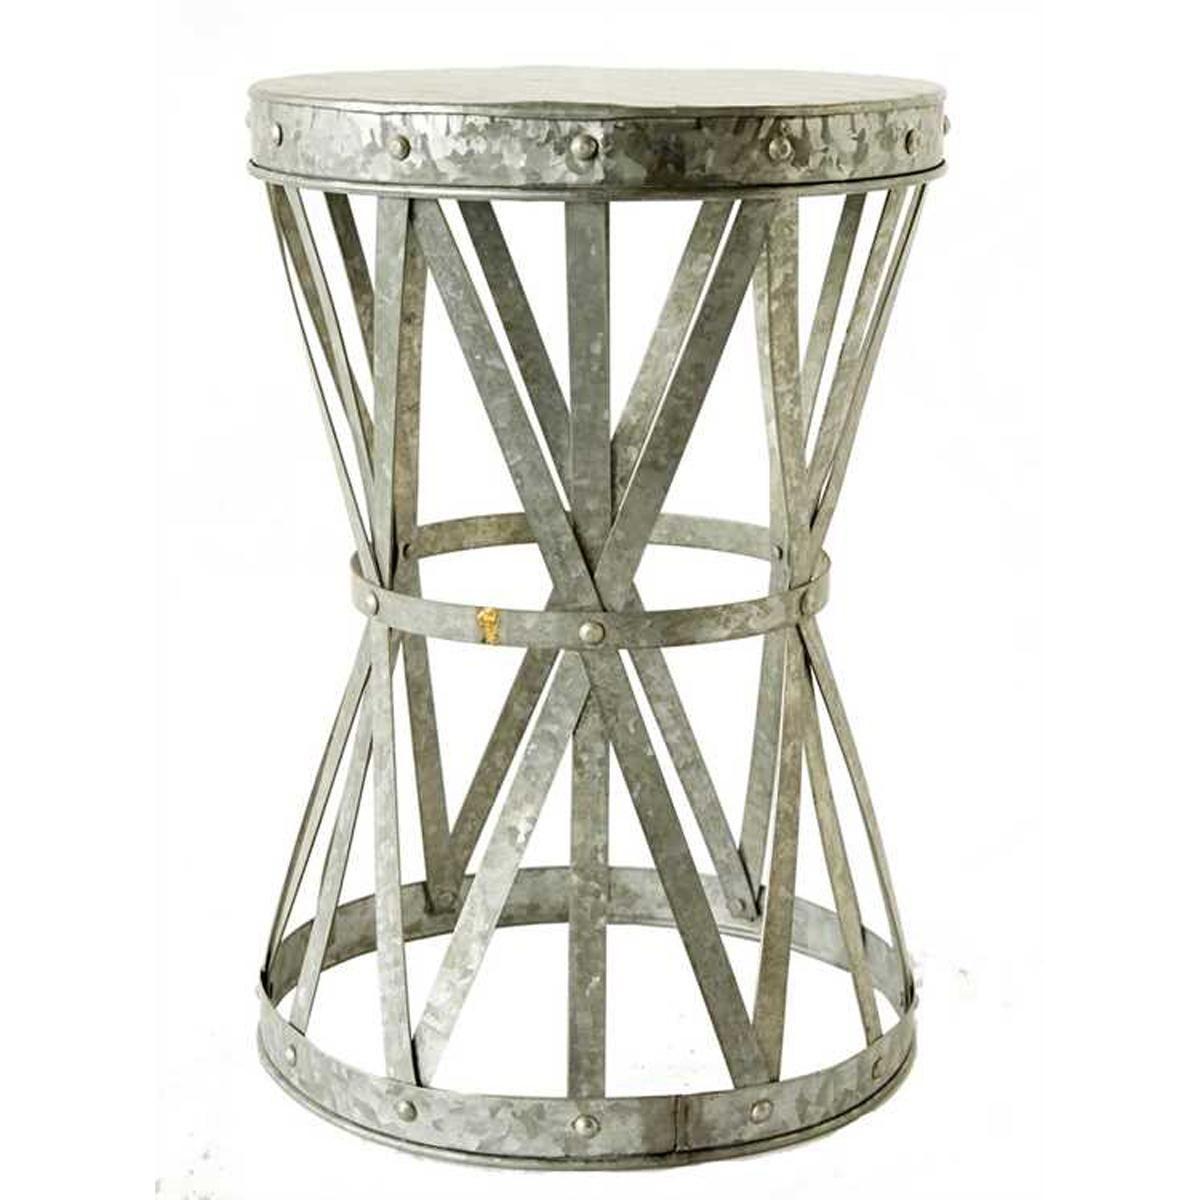 Galvanized Metal Side Table Stool Metal Side Table Side Table Round Metal Side Table